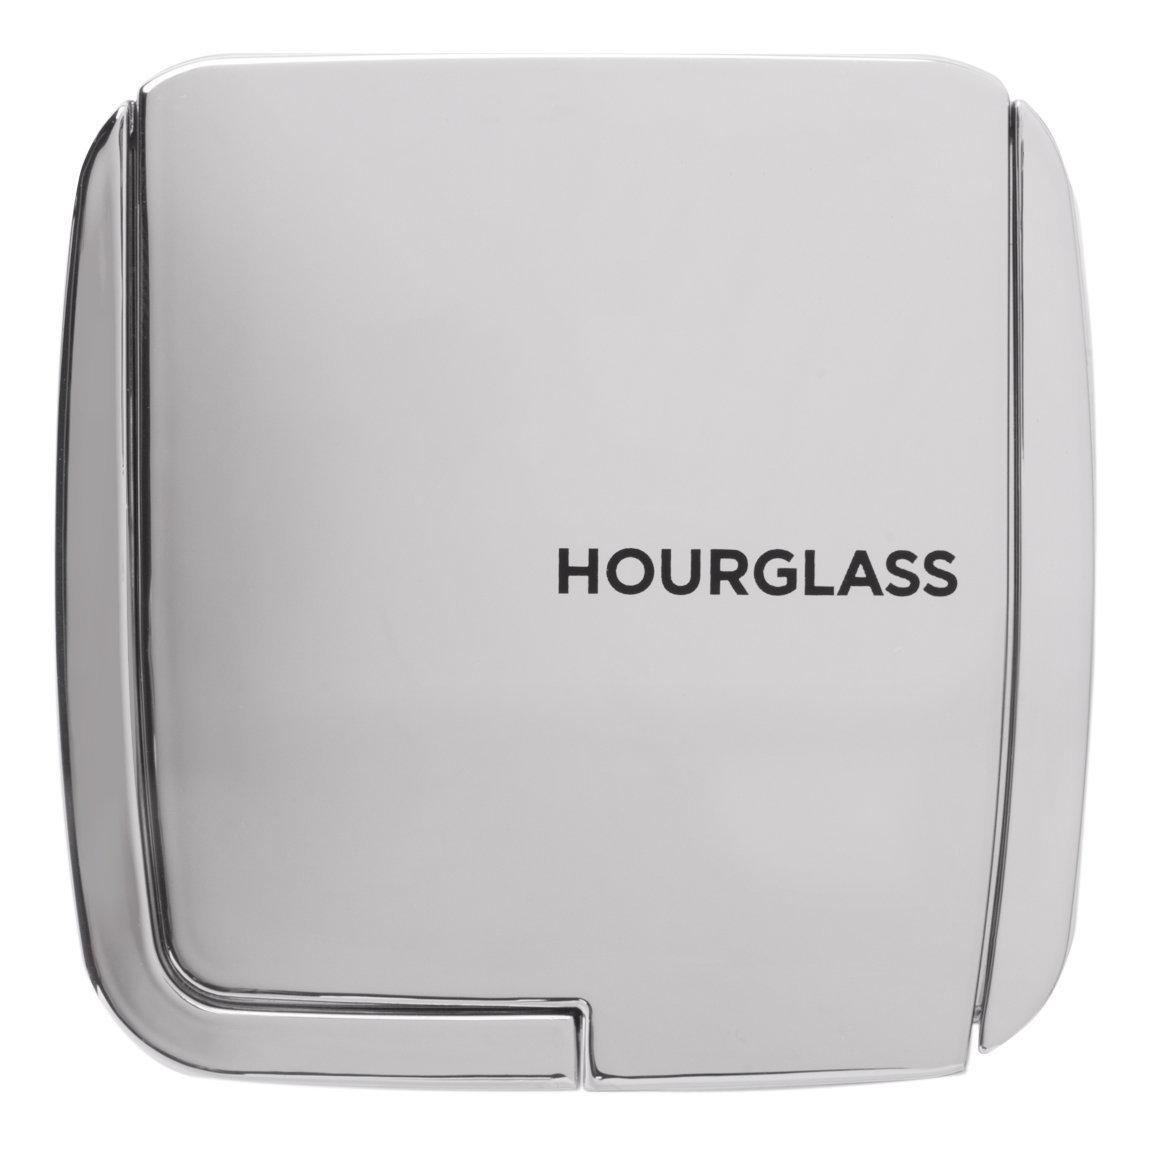 Hourglass Ambient Strobe Lighting Powder пудра-хайлайтер 4,6г